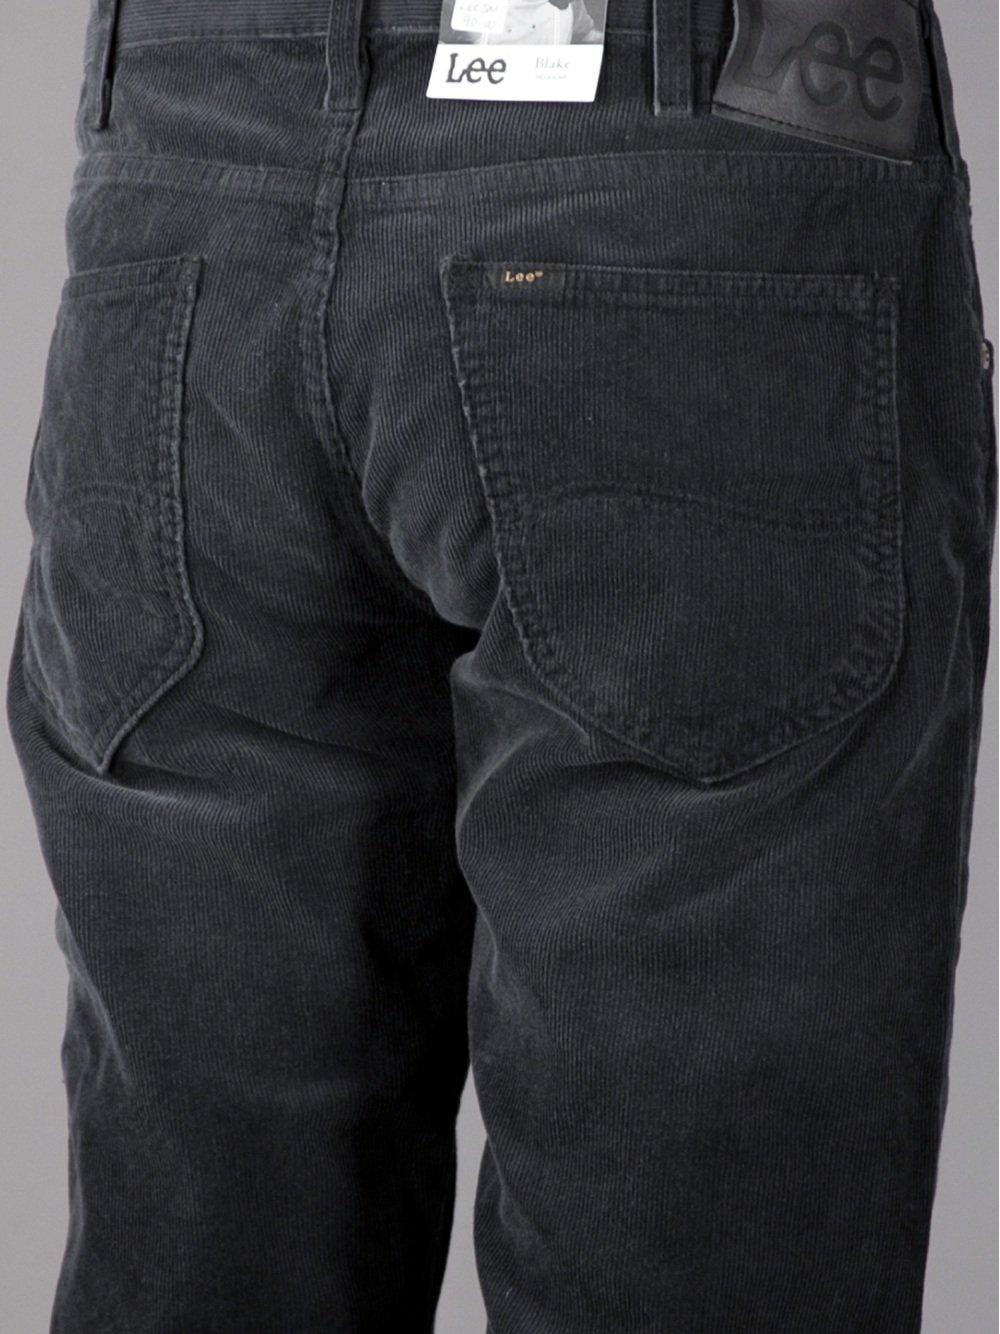 Lee Jeans Blake Corduroy Jeans In Black For Men Lyst